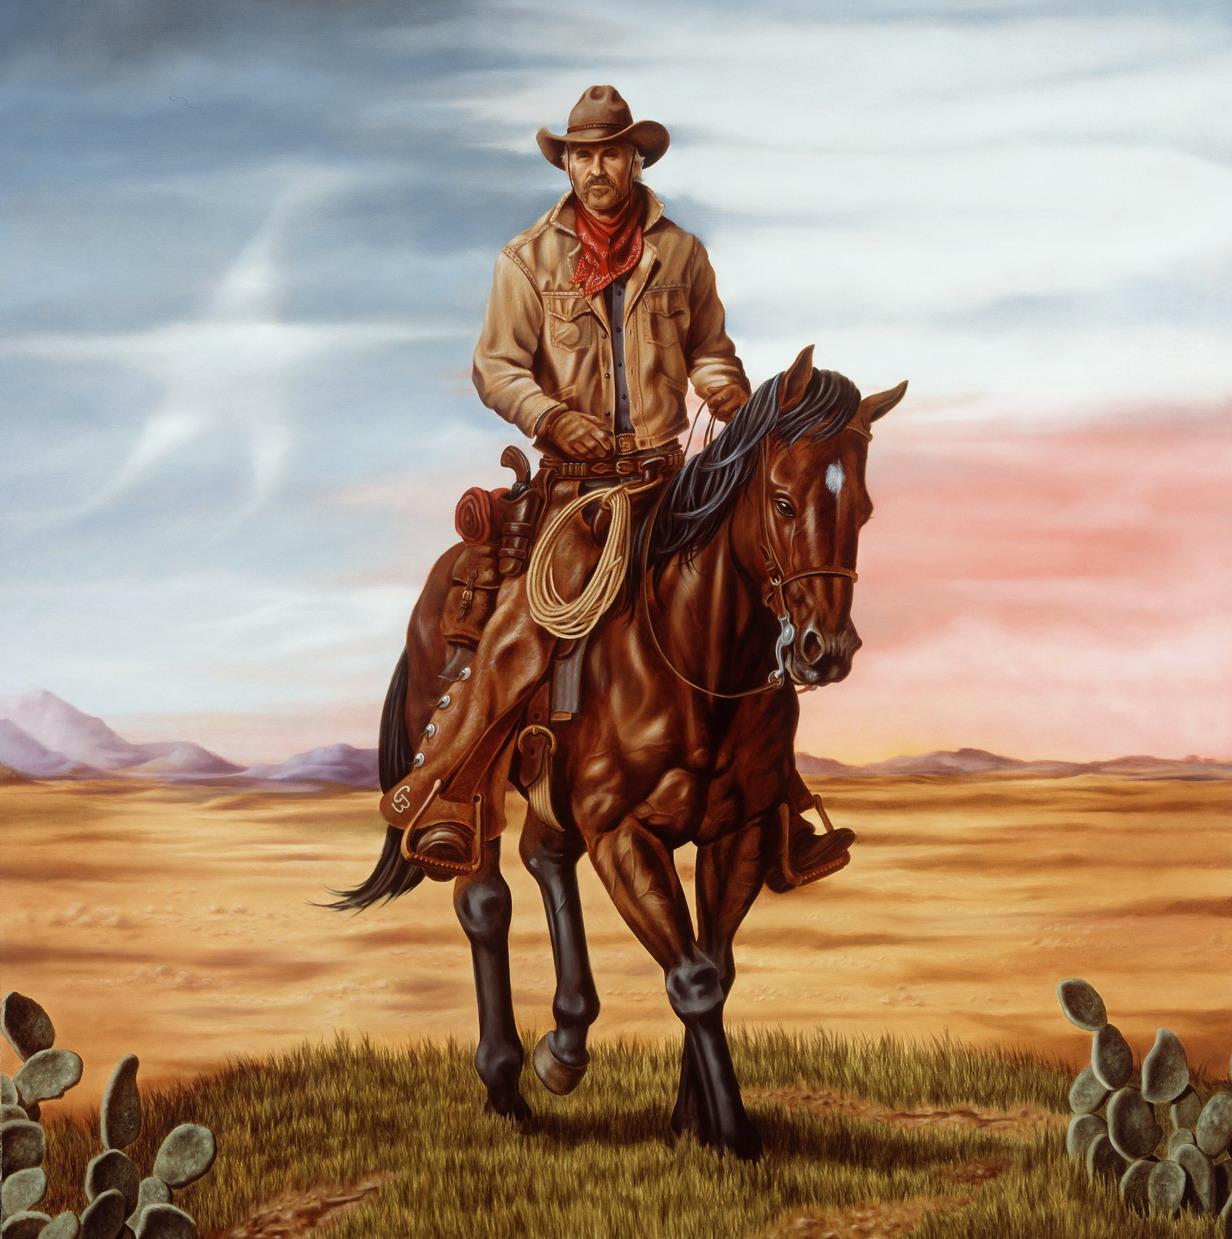 Western Cowboy Art Painting HD Wallpaper 1232x1239